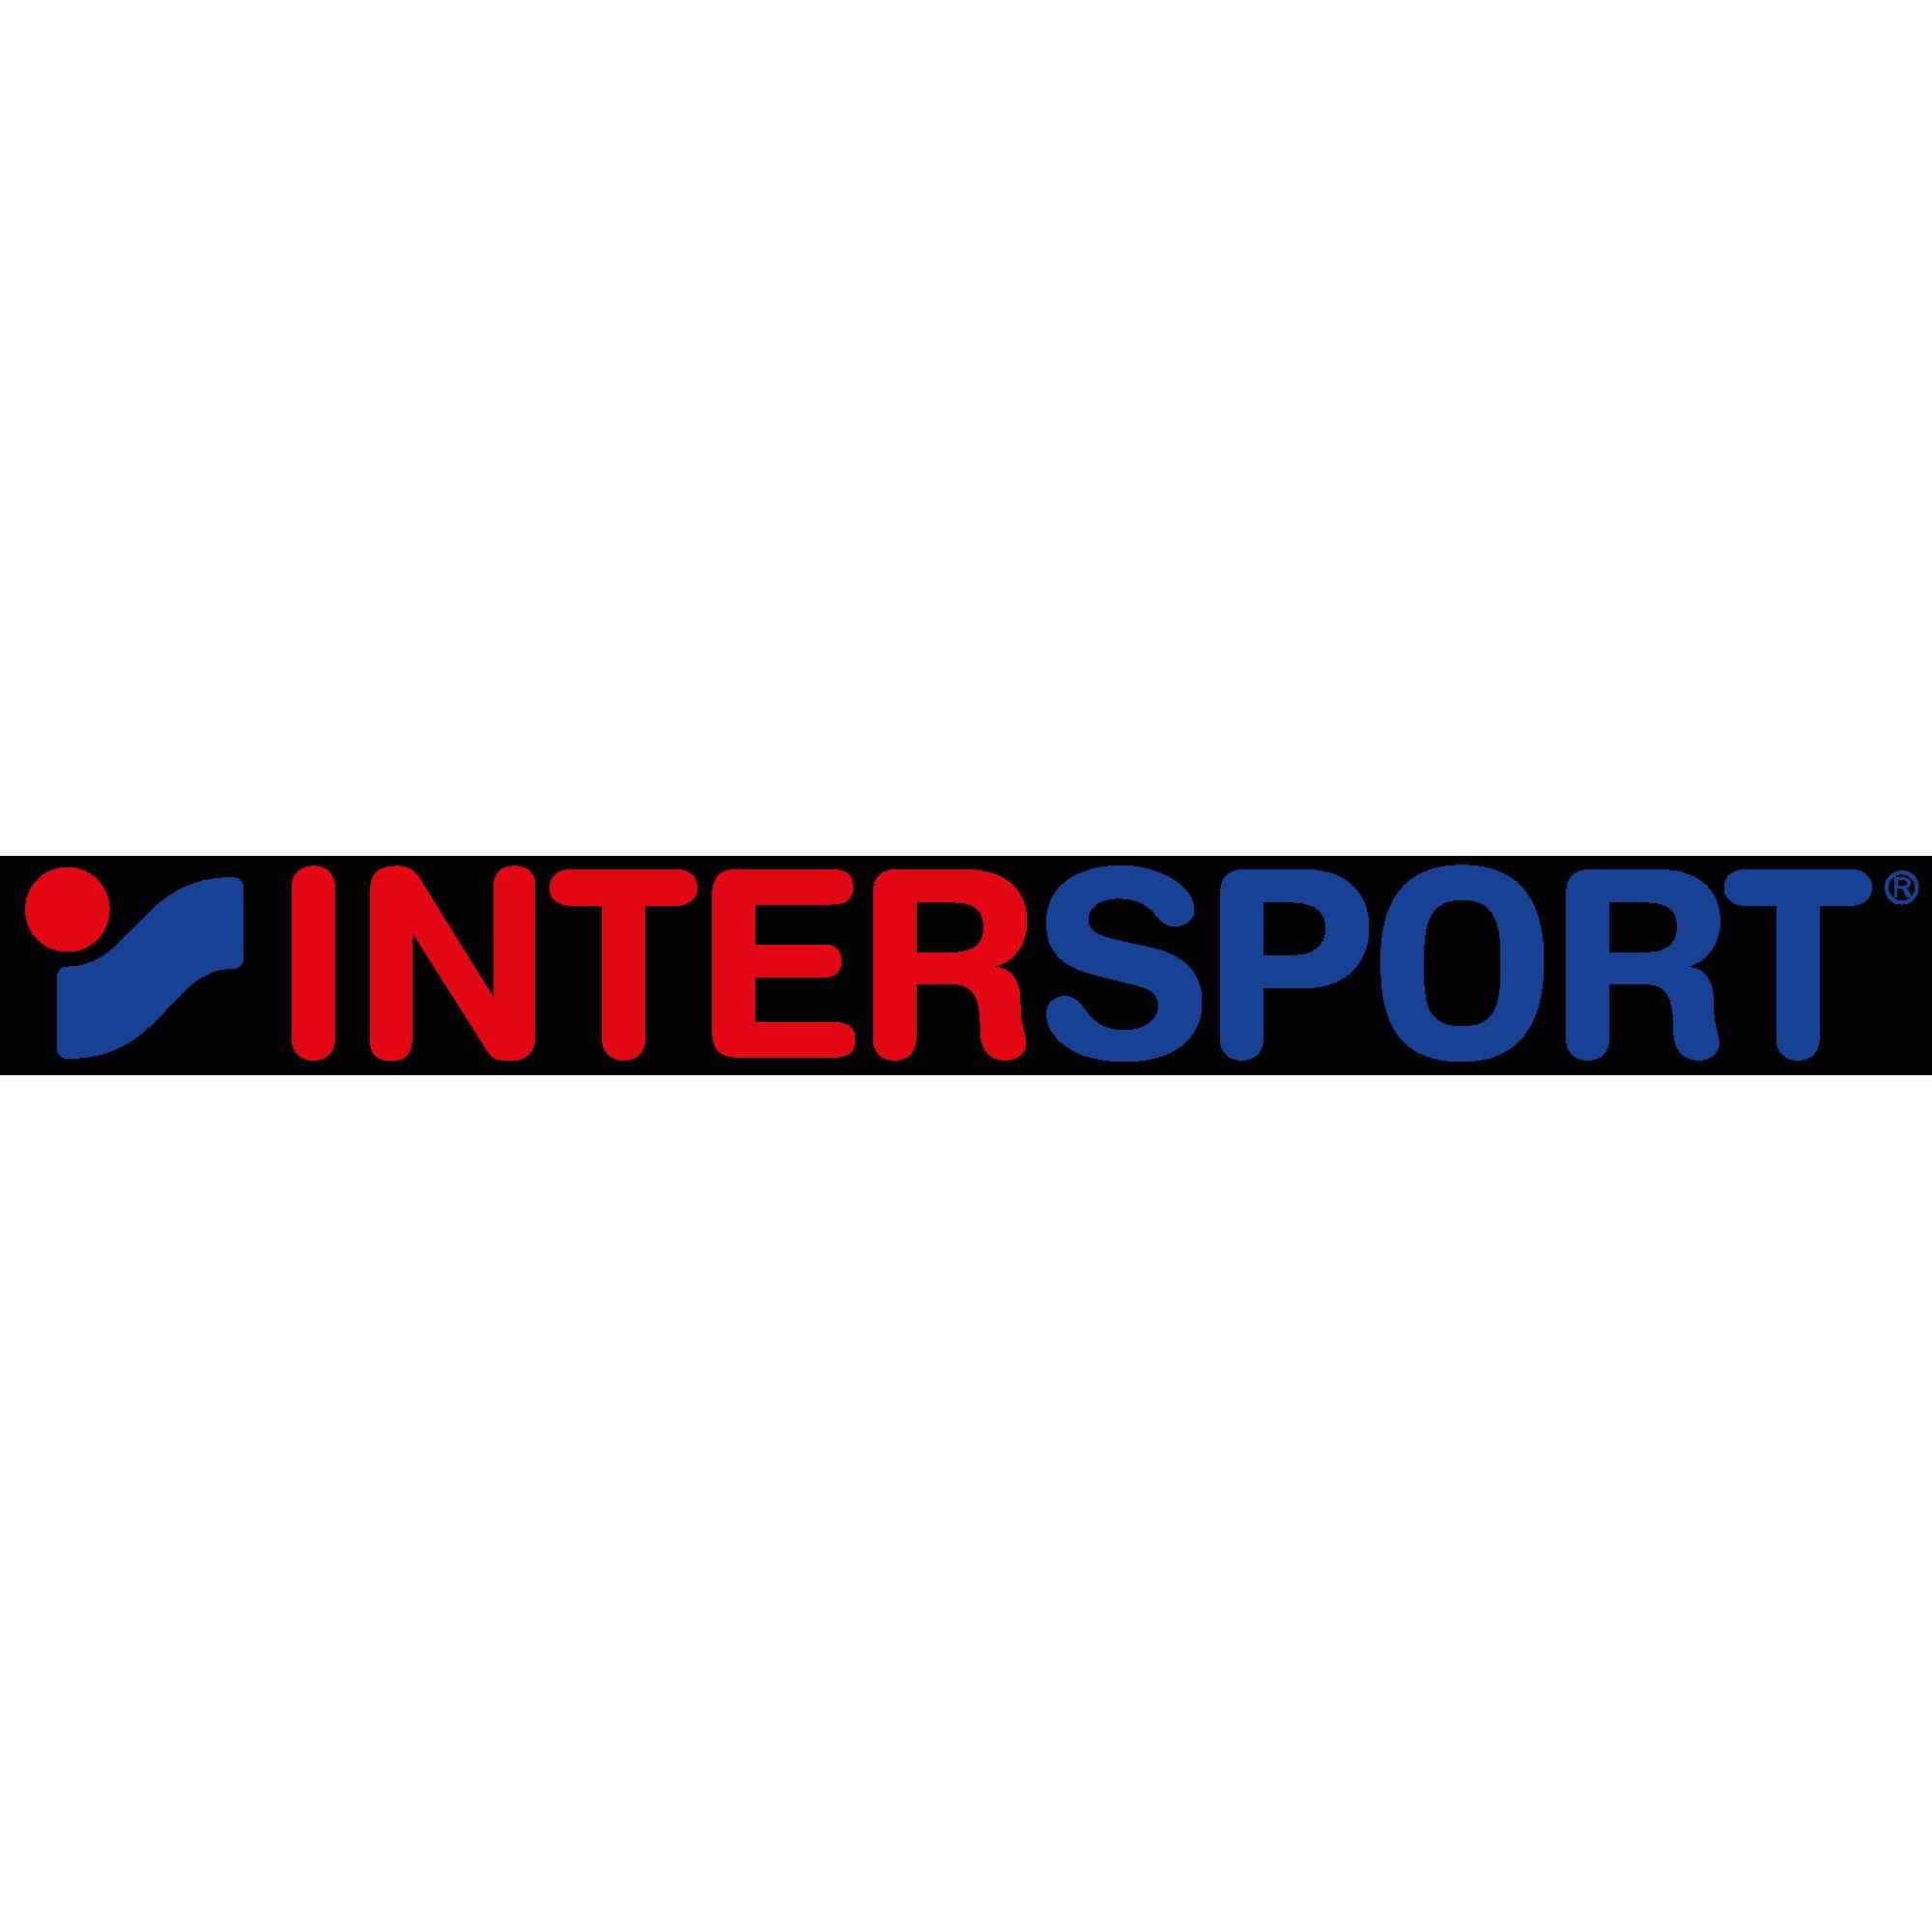 cc63dee552429 Intersport leták - platný 12. 06. 2019 - 23. 06. 2019 | Kupino.sk